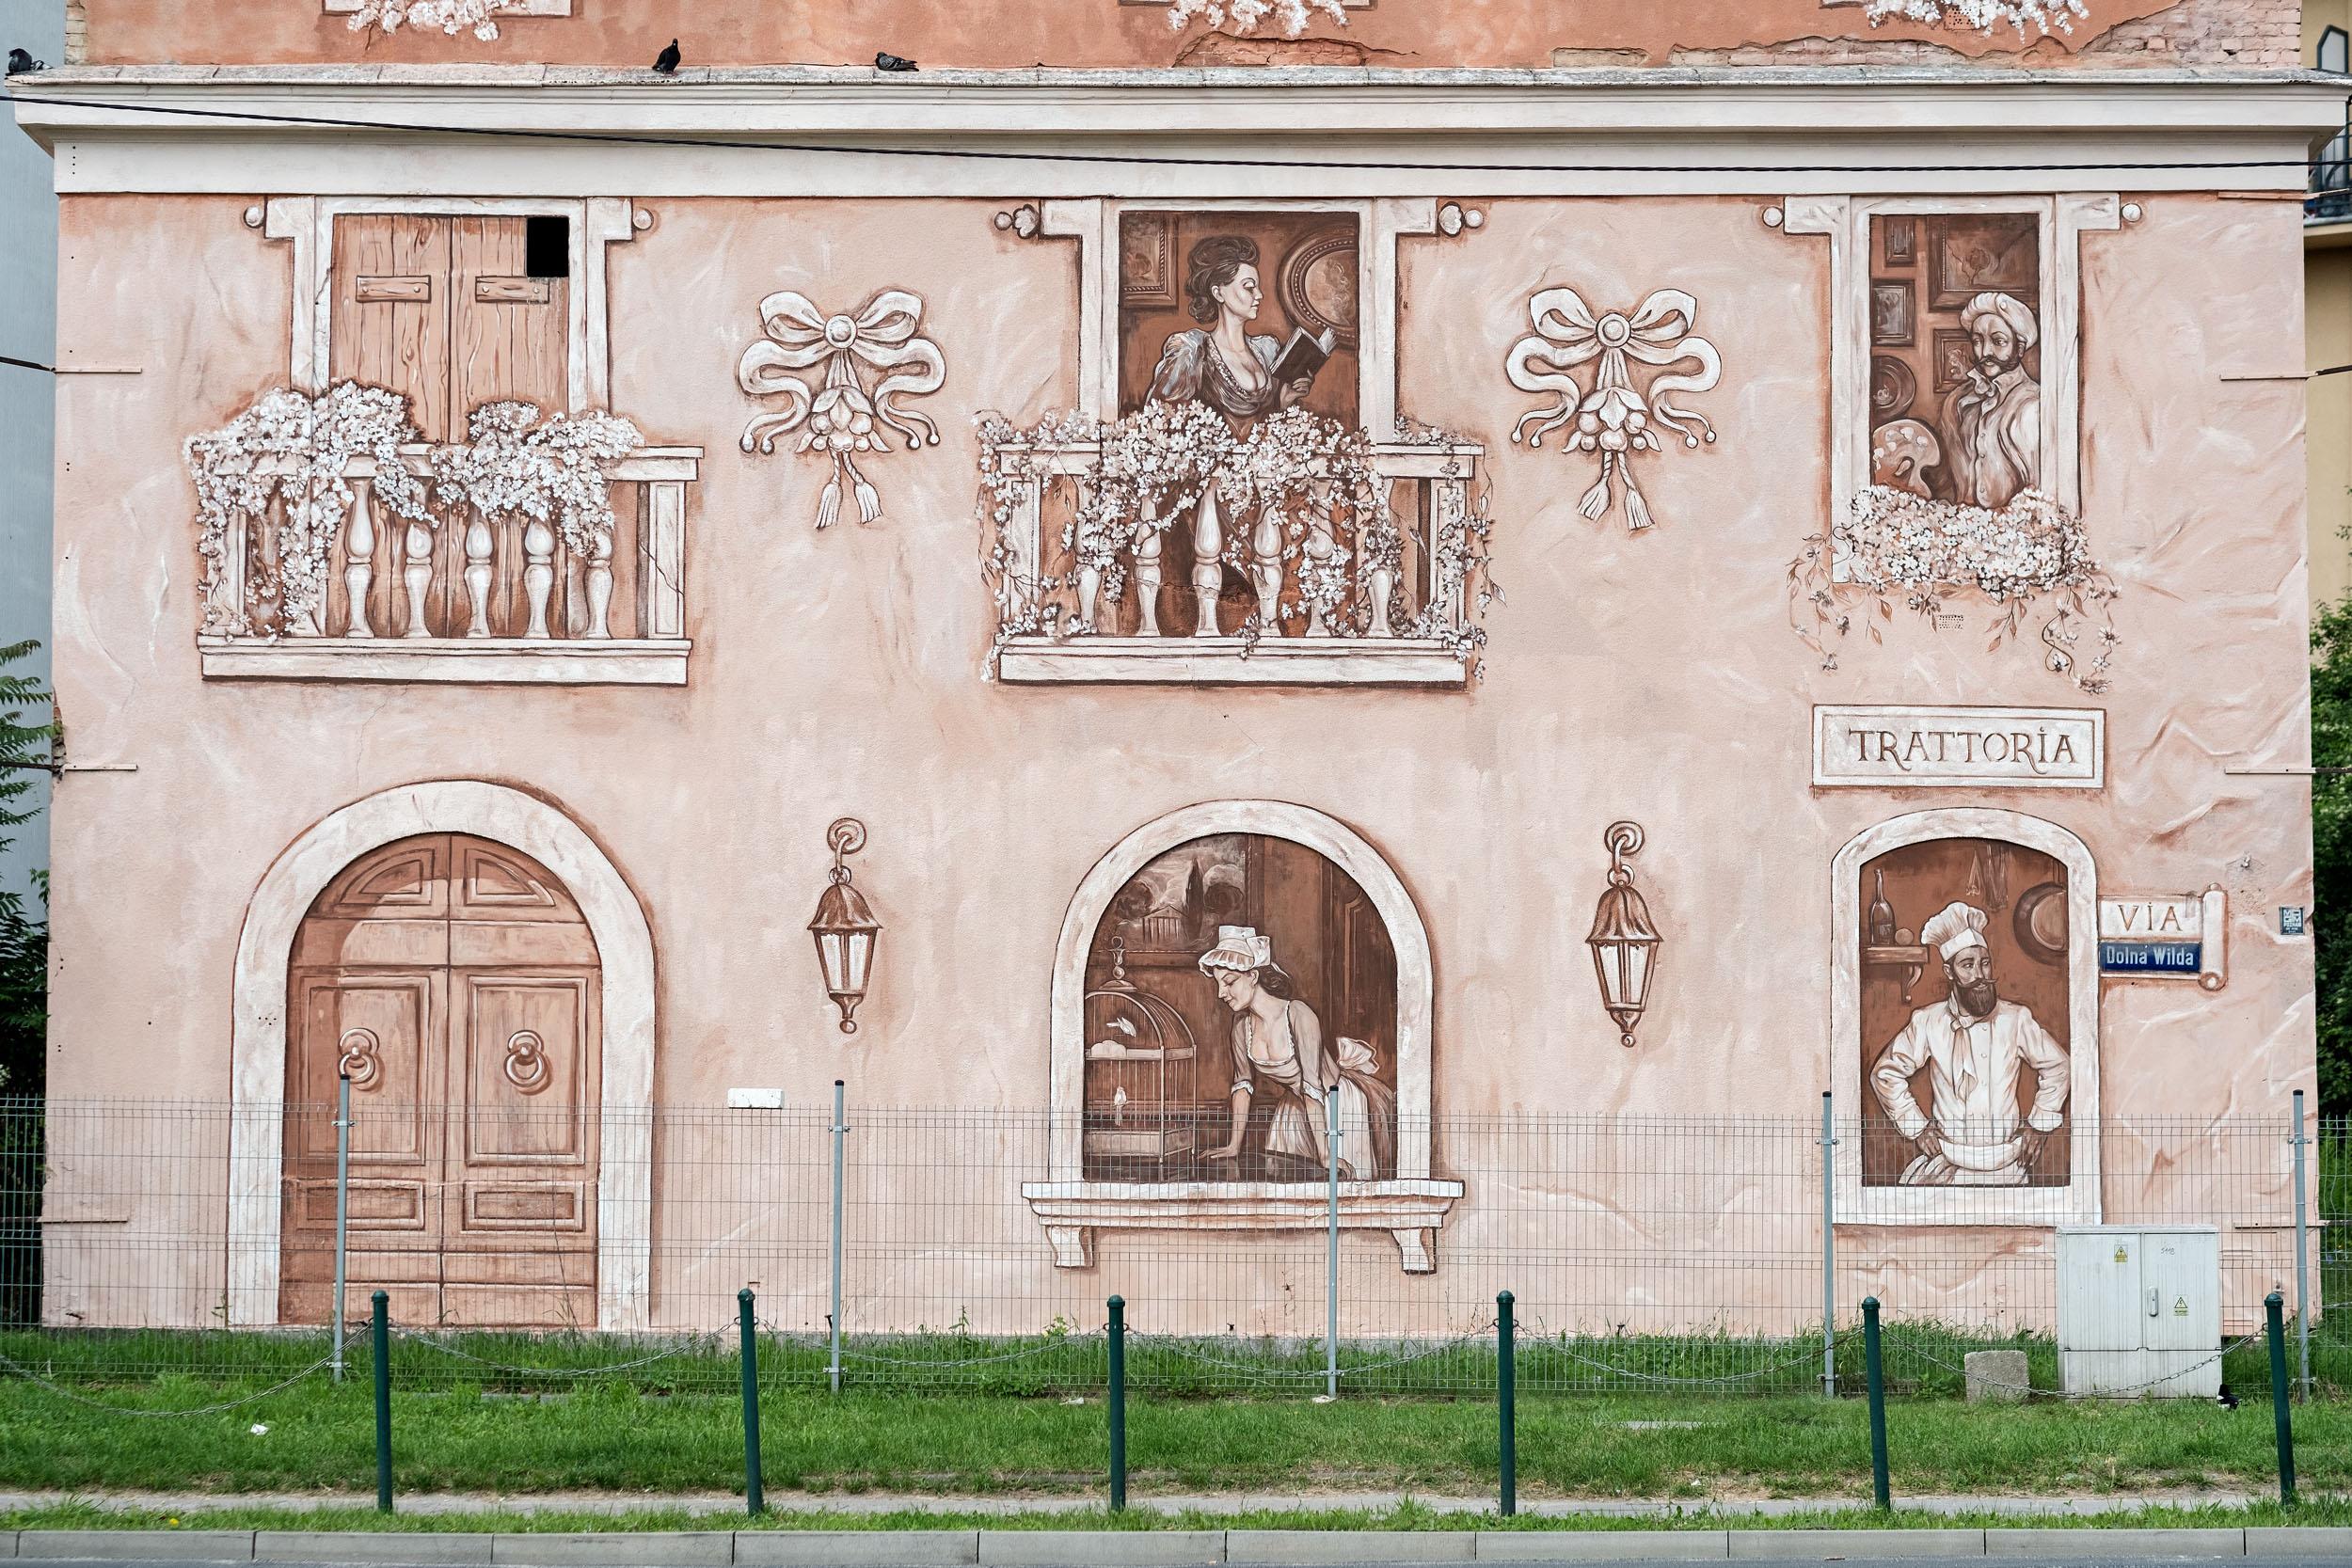 """Neighbors"" by Mark Maksimovich and Alex Novitski in Poznan, Poland Artes & contextos 005"